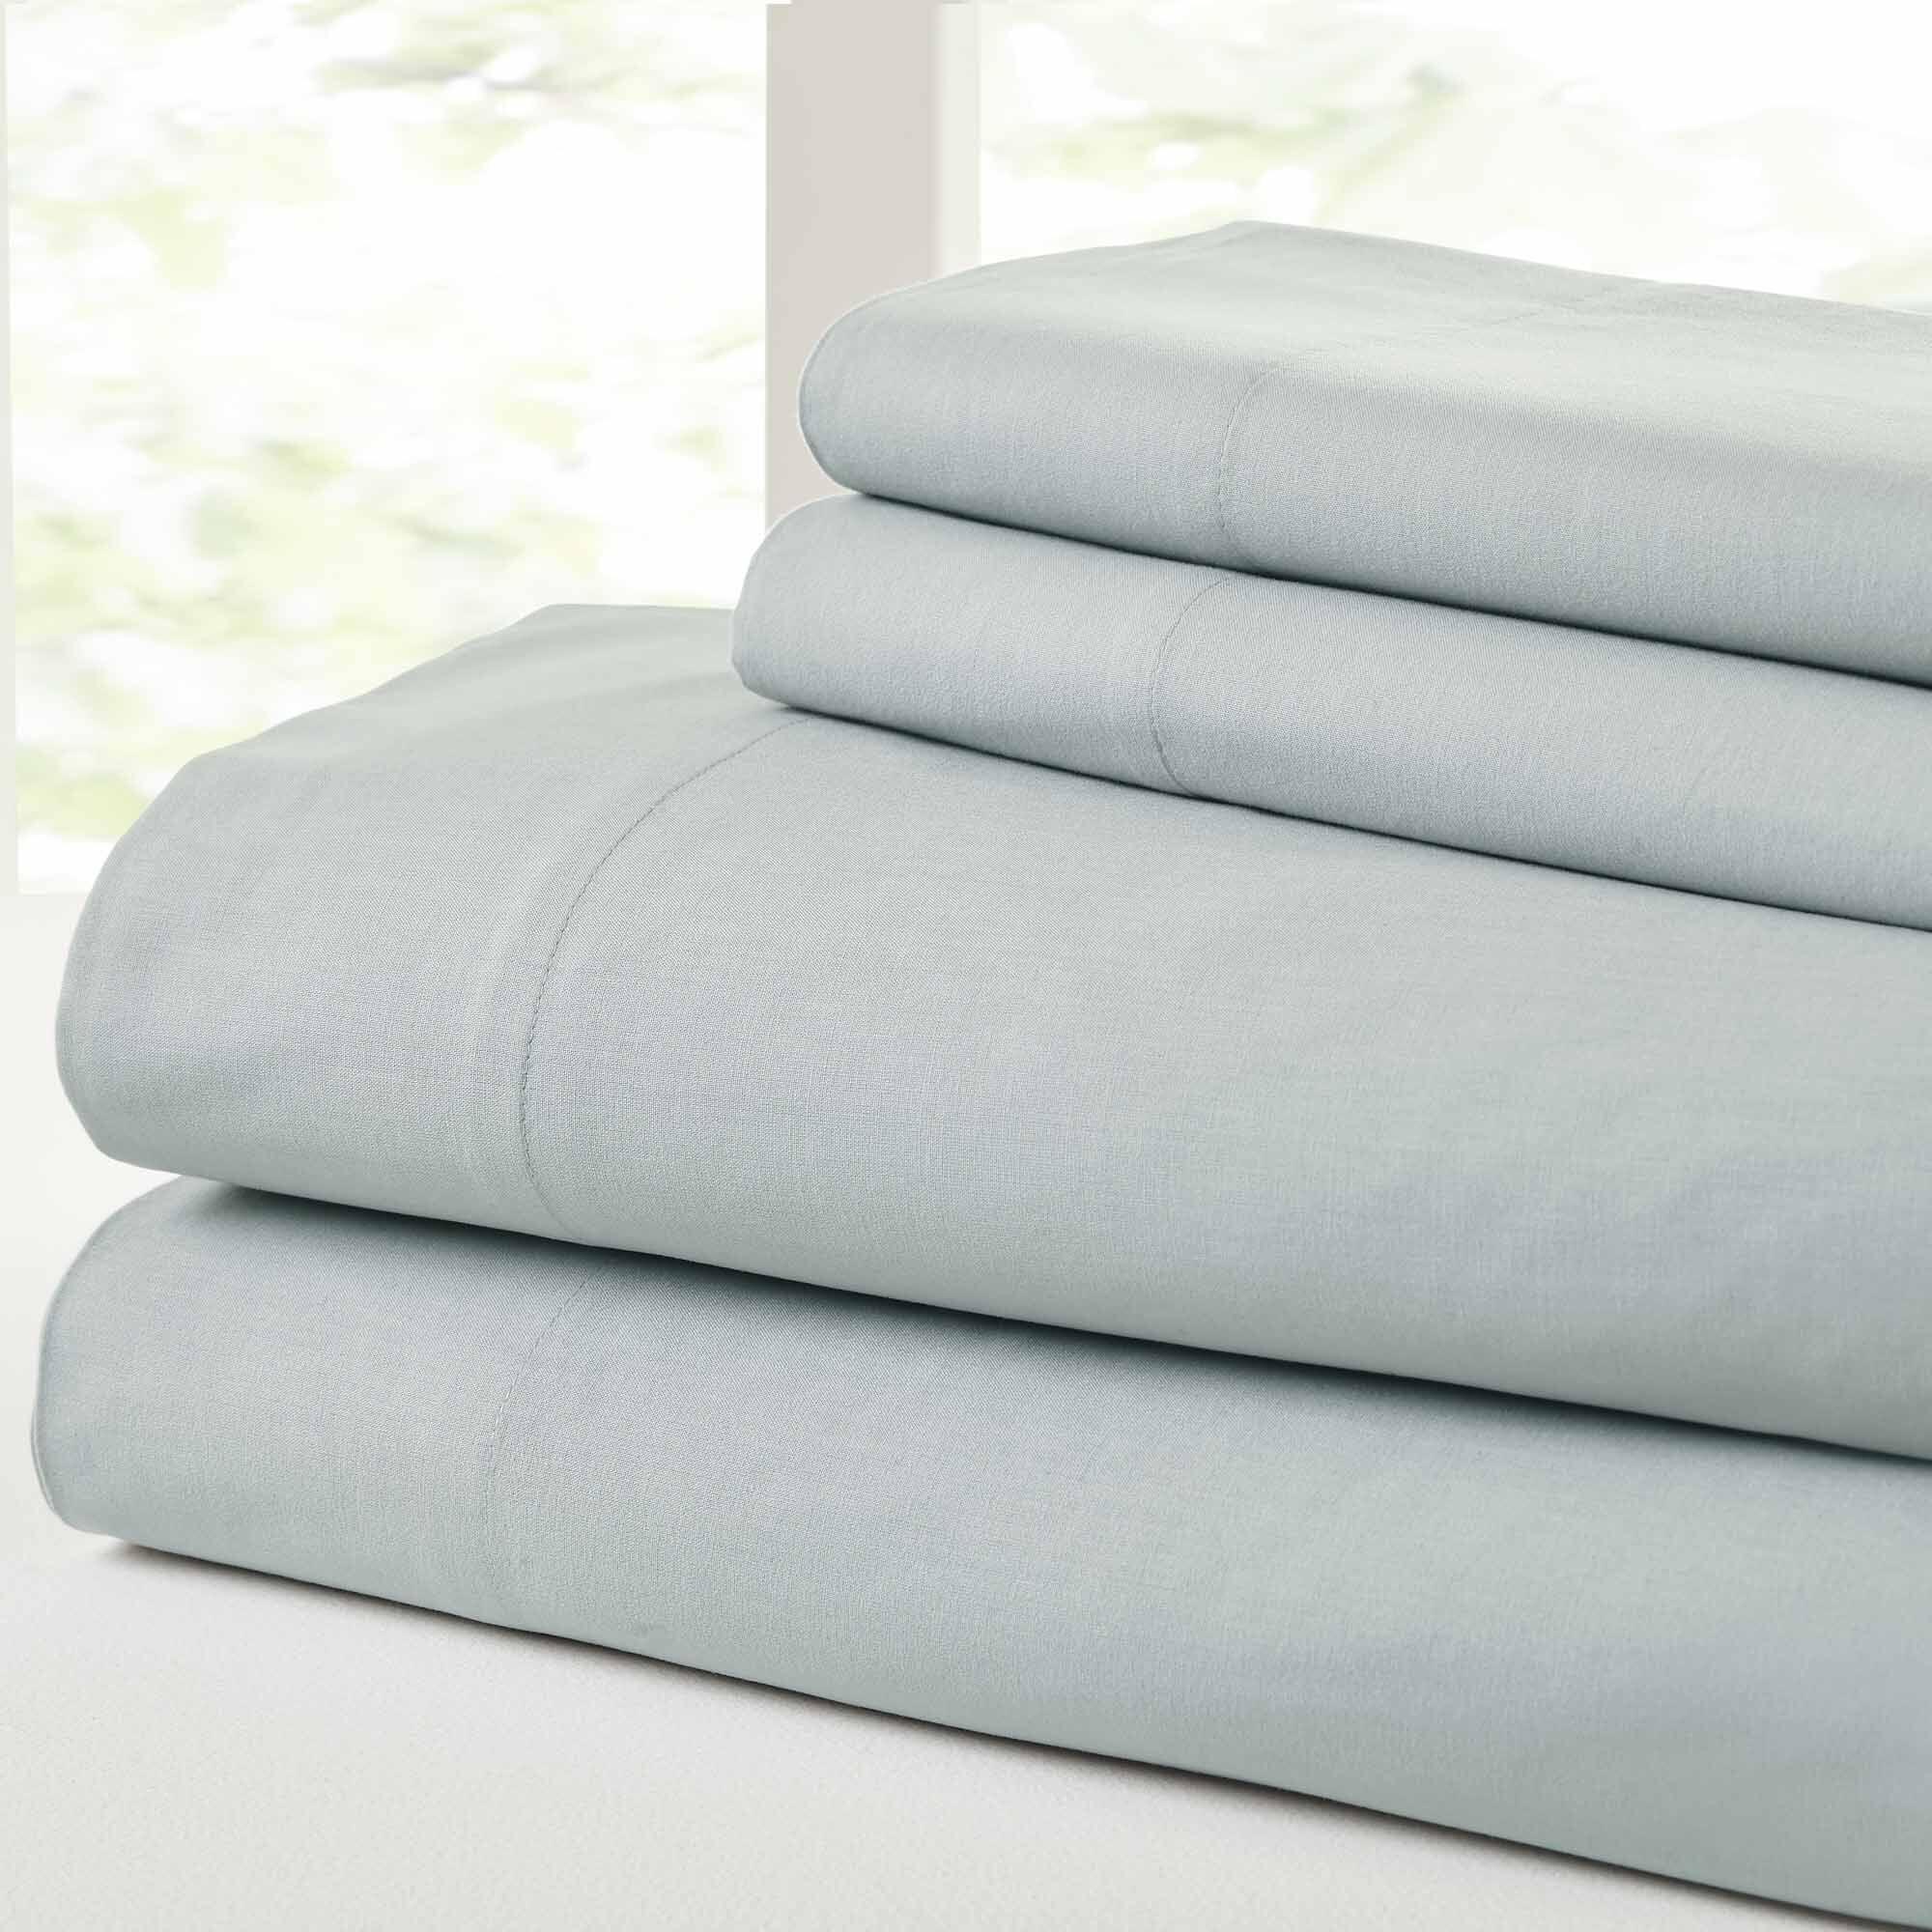 Savion Vintage 100% Cotton Sheet Set Size: California King, Color: Lt. Blue